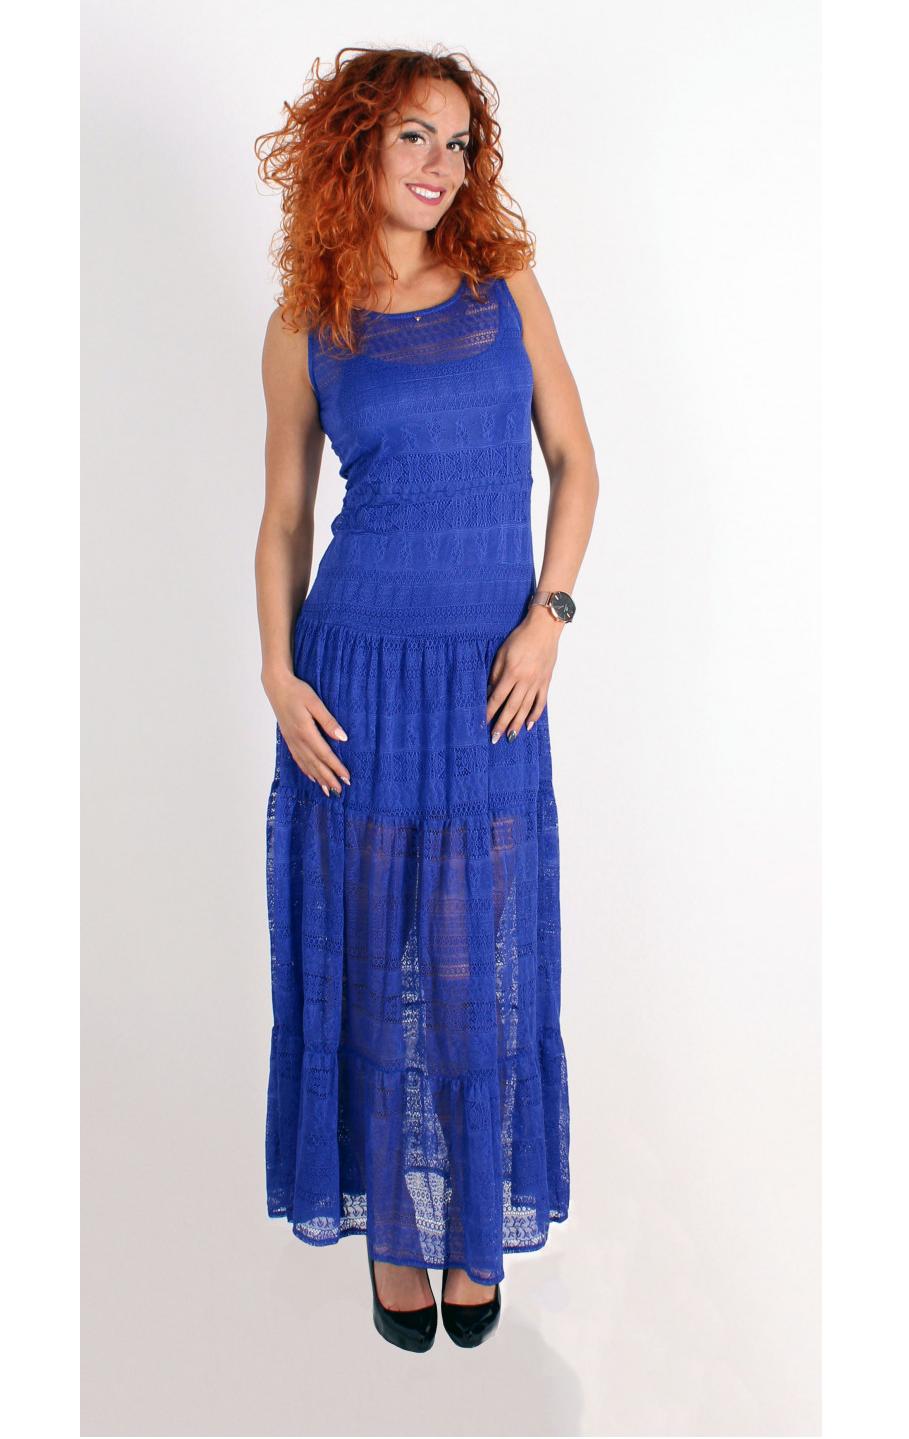 Guess Guess by MARCIANO modré šaty dlouhé